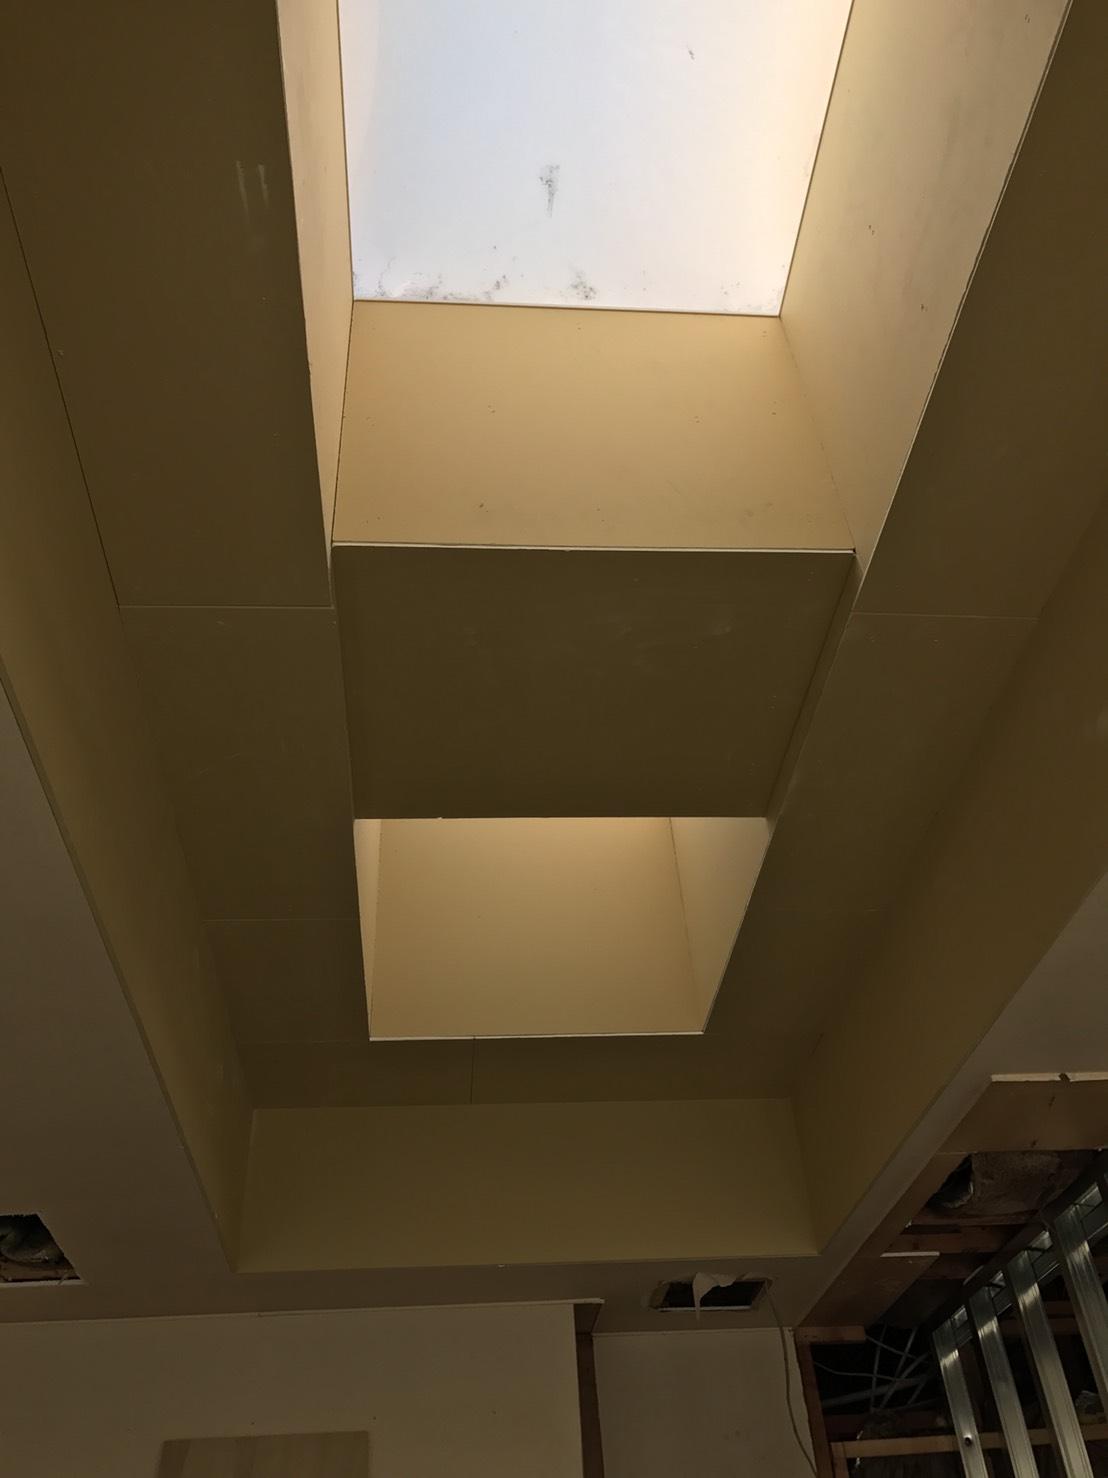 愛知県名古屋市の建築一般工事 リフォーム工事の株式会社松昇 施工事例